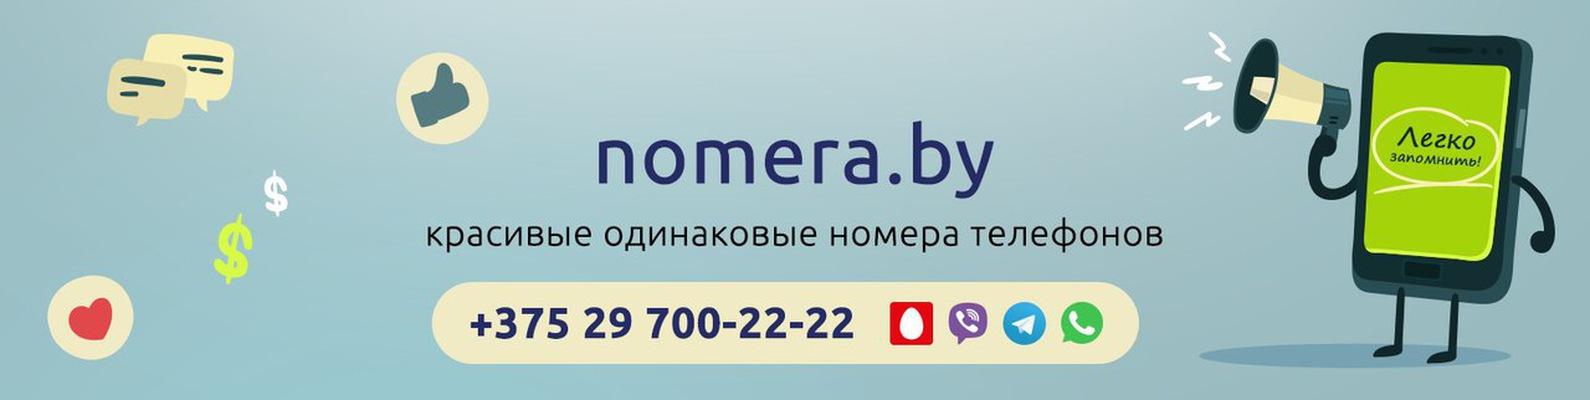 3e86d29121ca0 Красивые Номера Беларусь | ВКонтакте